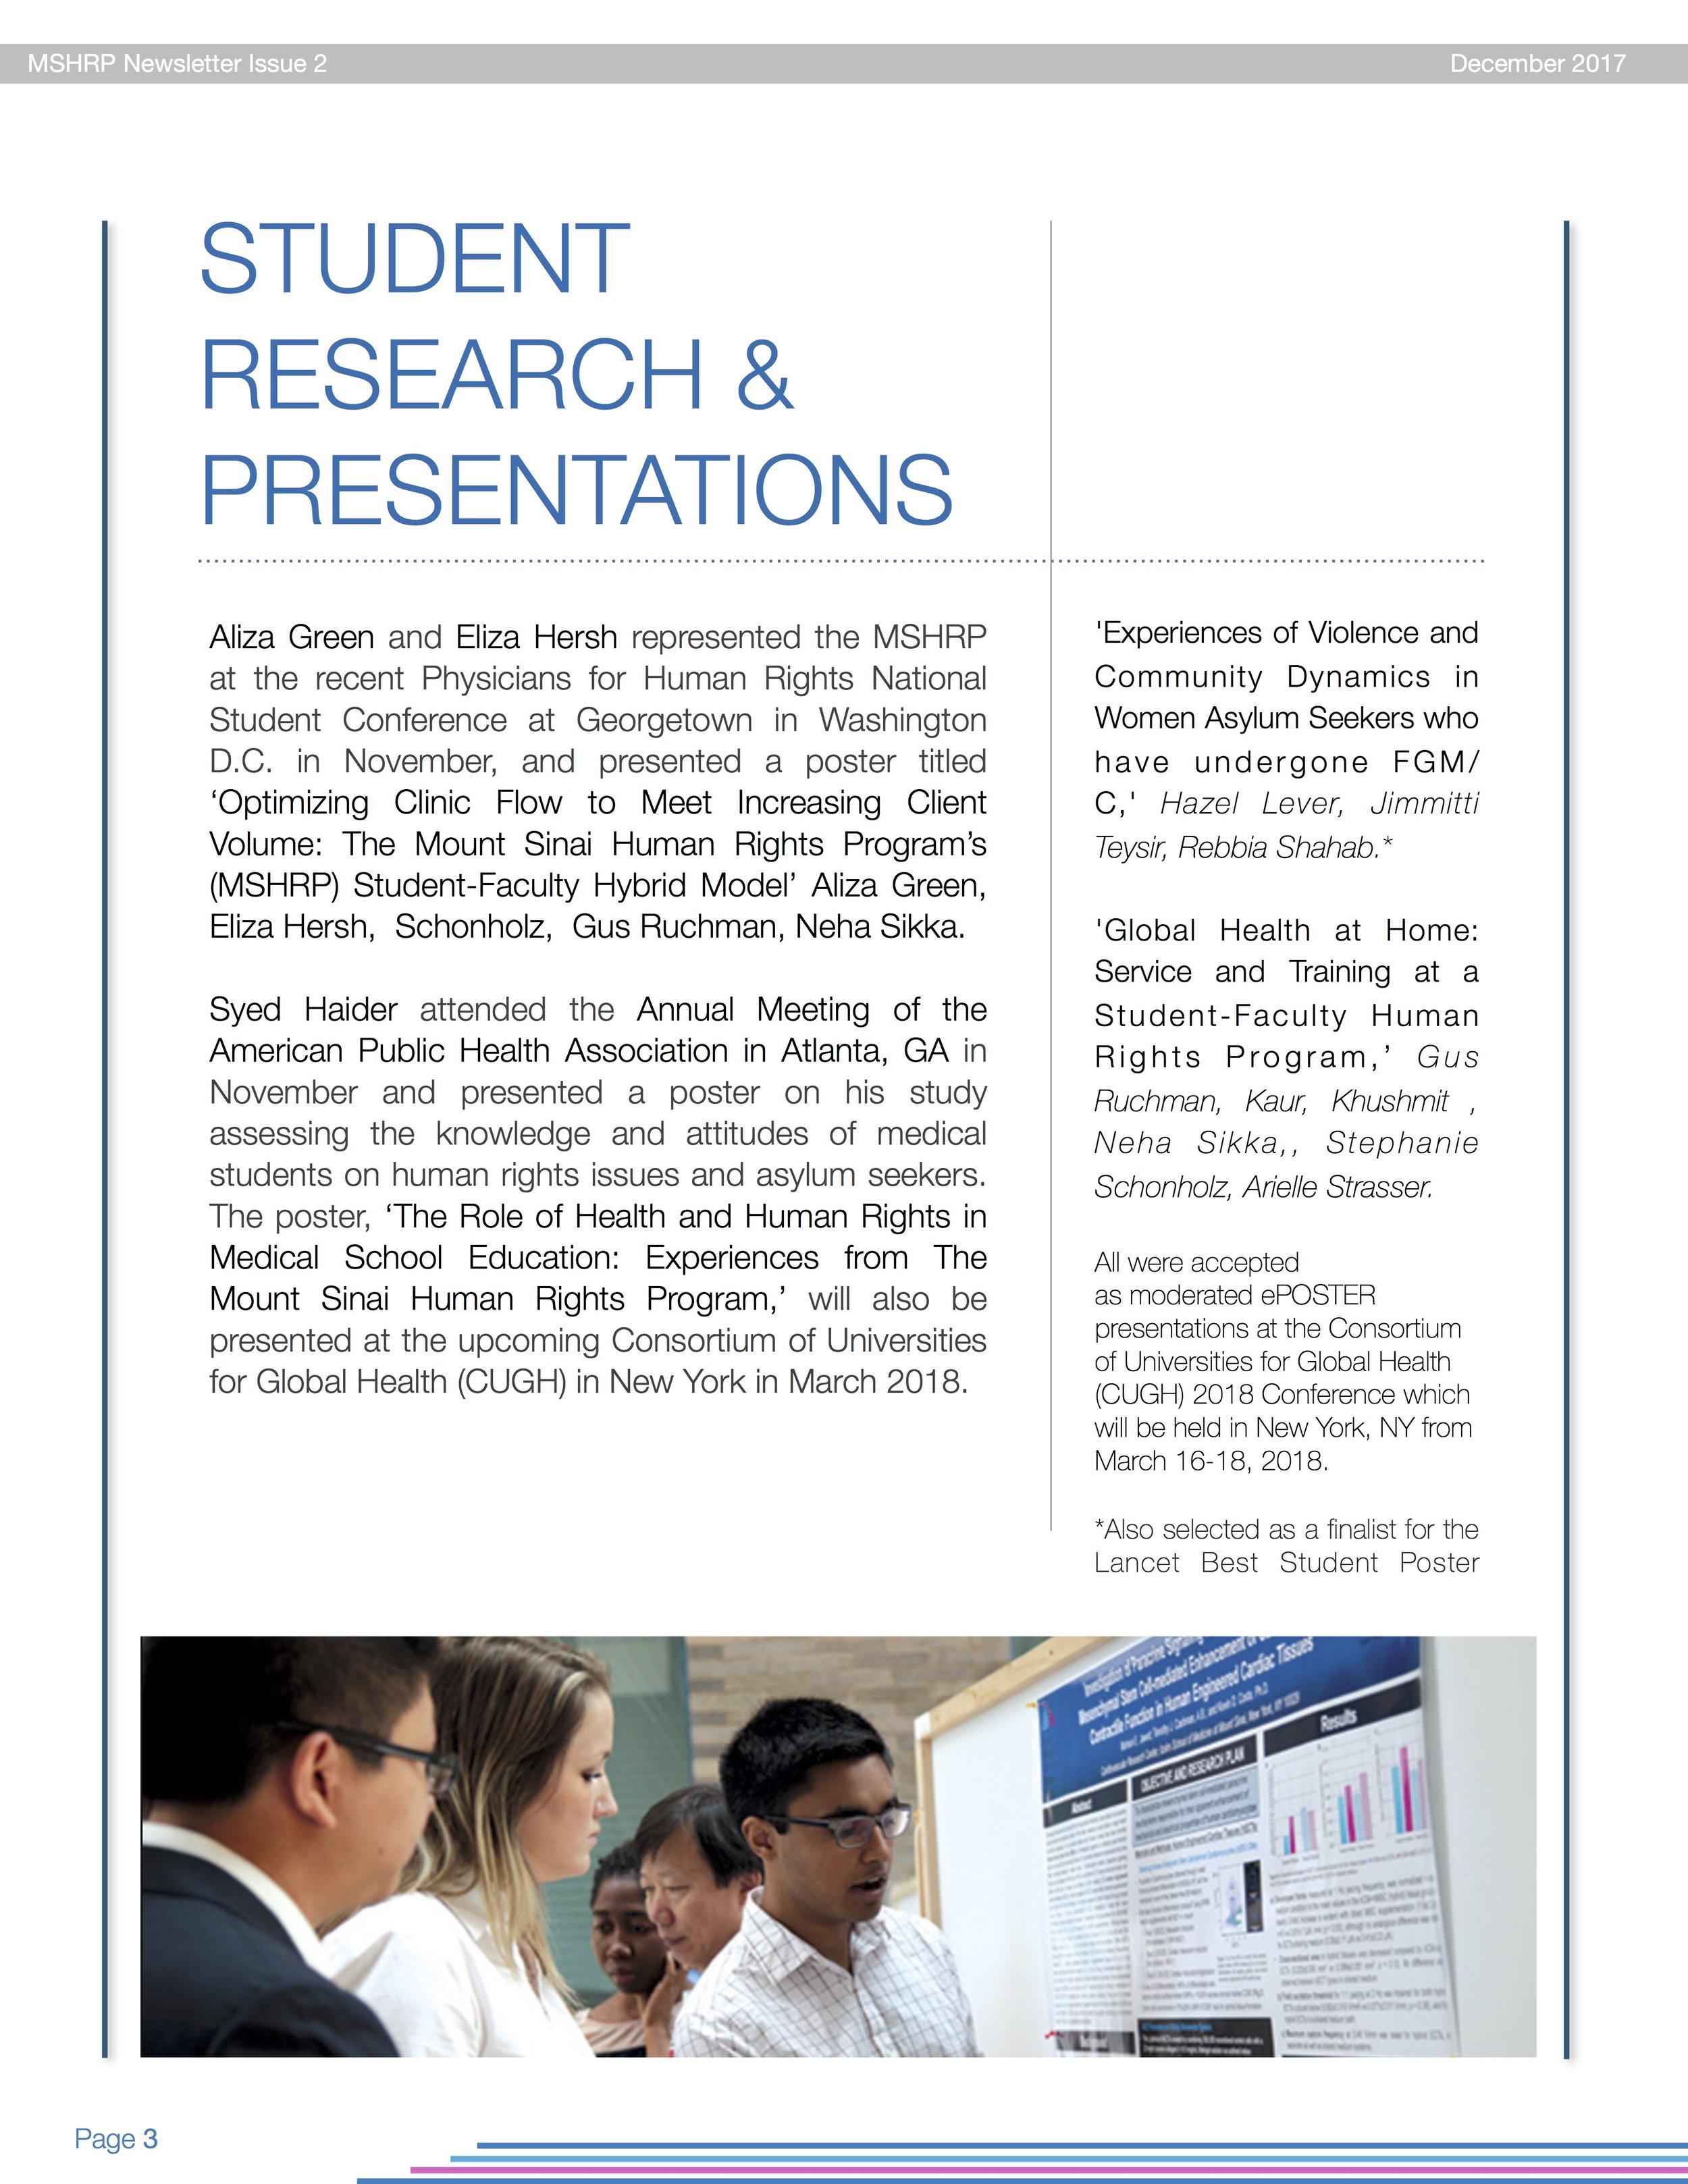 MSHRP Newsletter Issue 2 121017 (dragged) 2.jpg